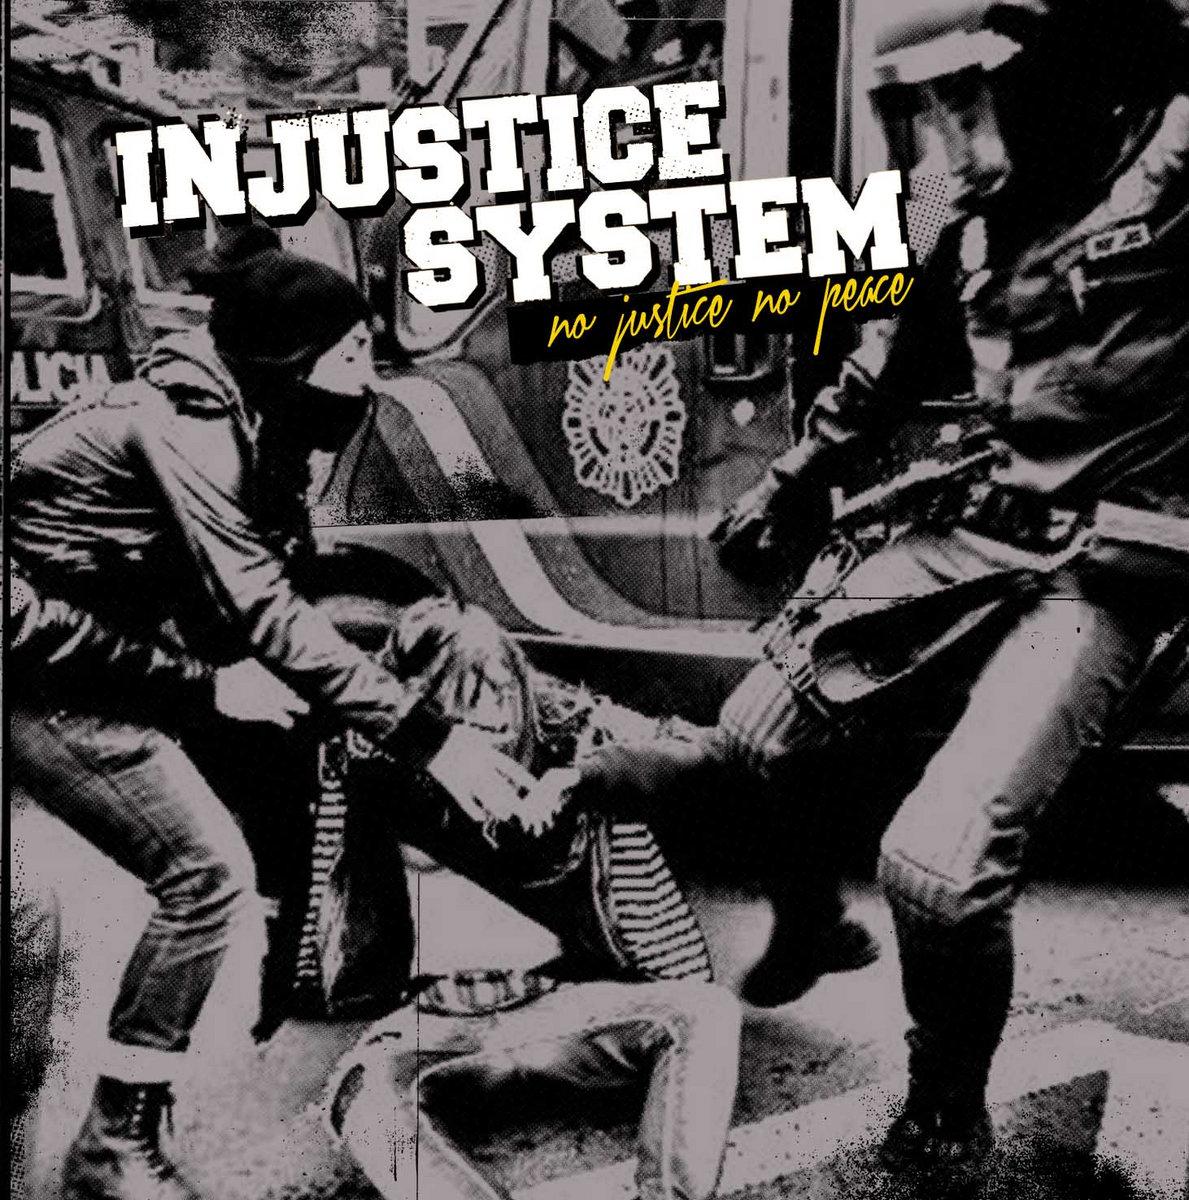 Injustice System - No justice, no peace CD